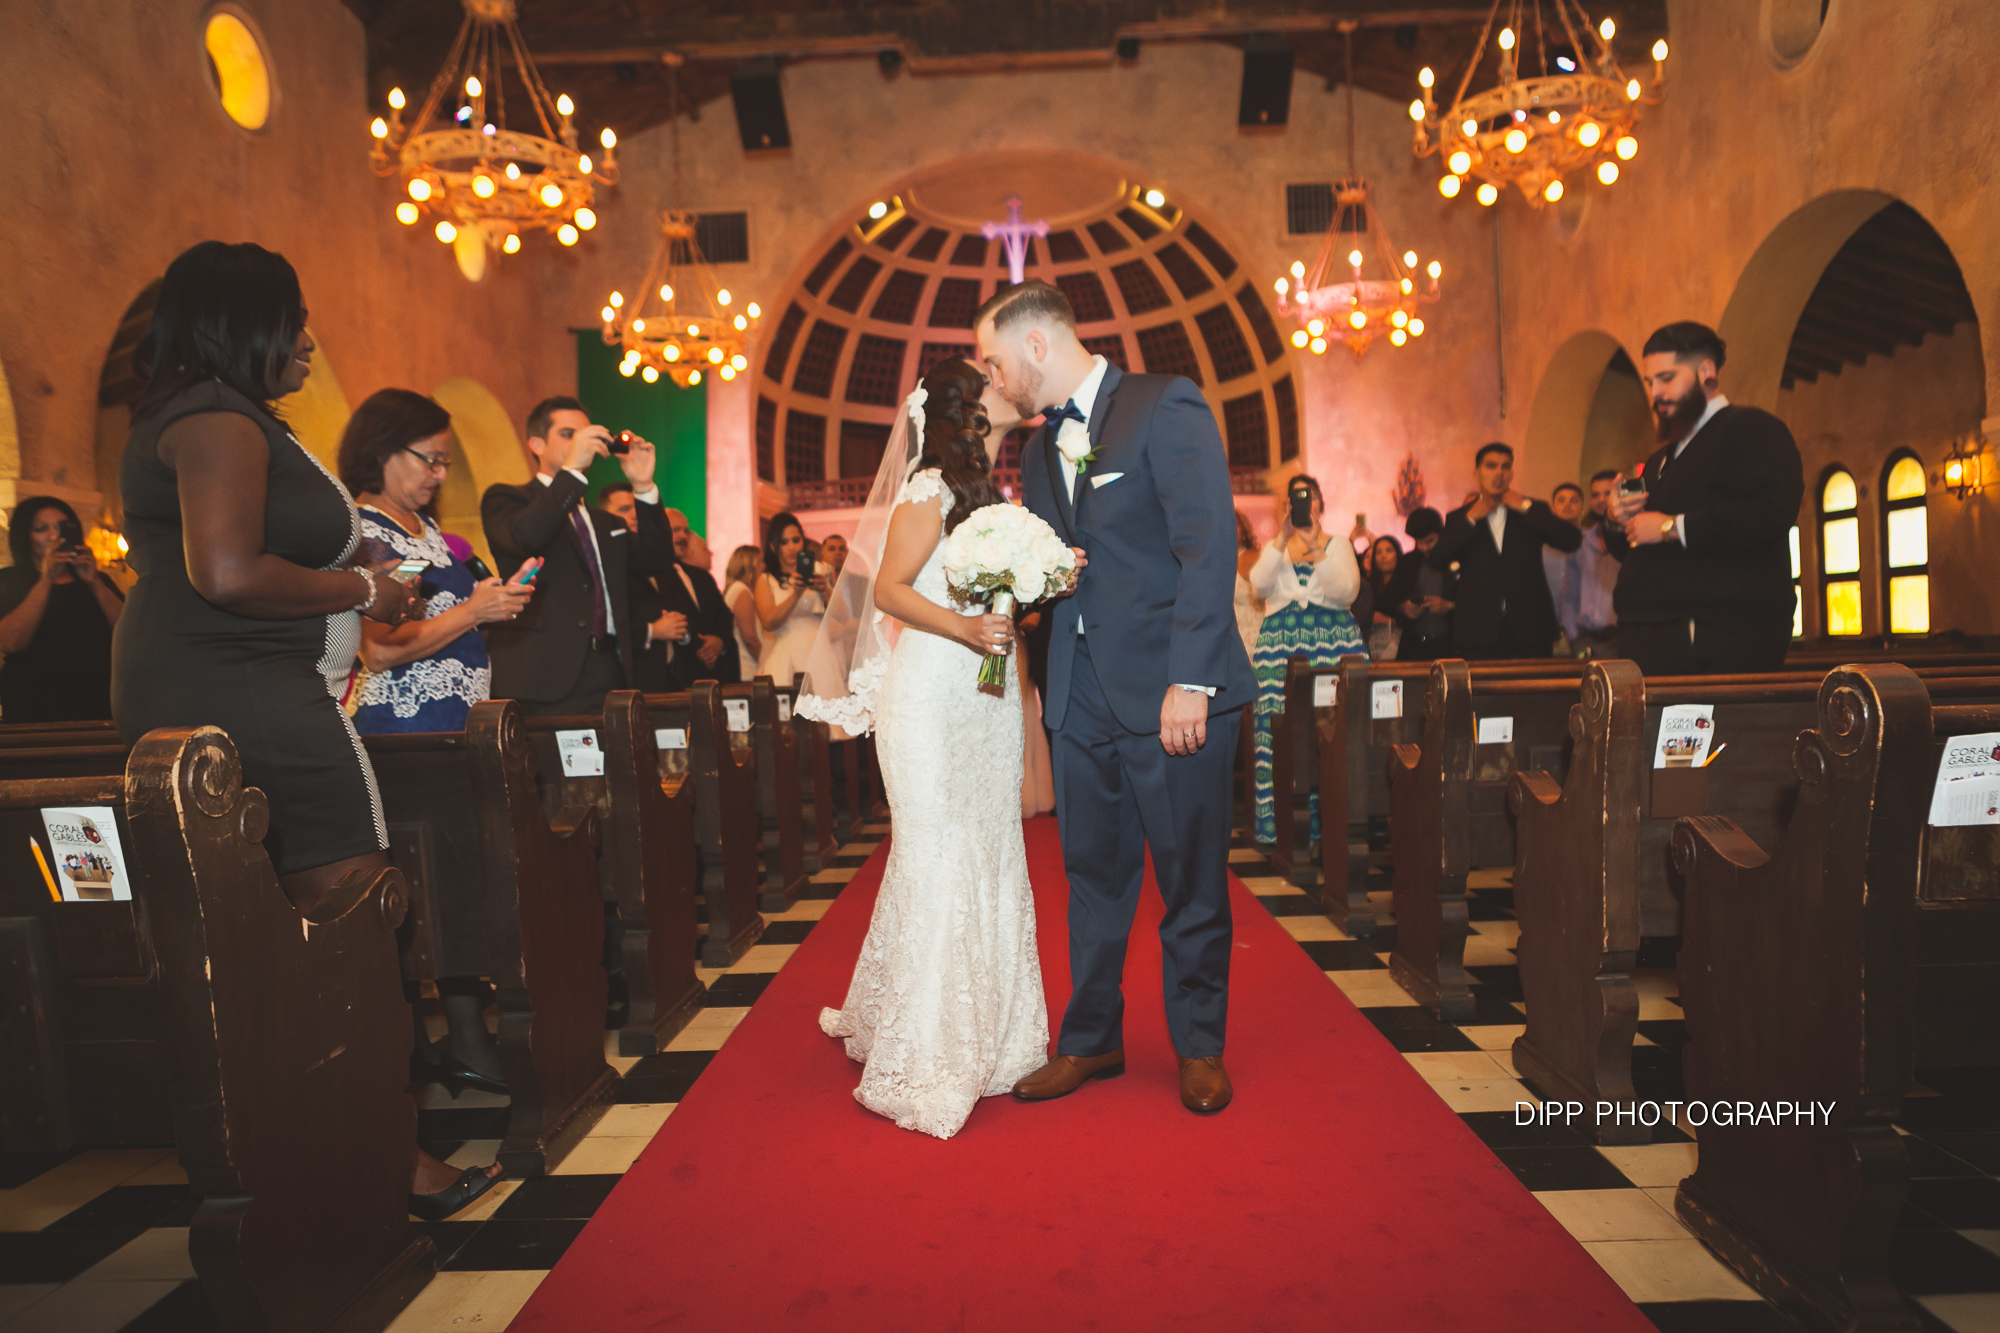 Dipp_2016 EDITED Melissa & Avilio Wedding-249